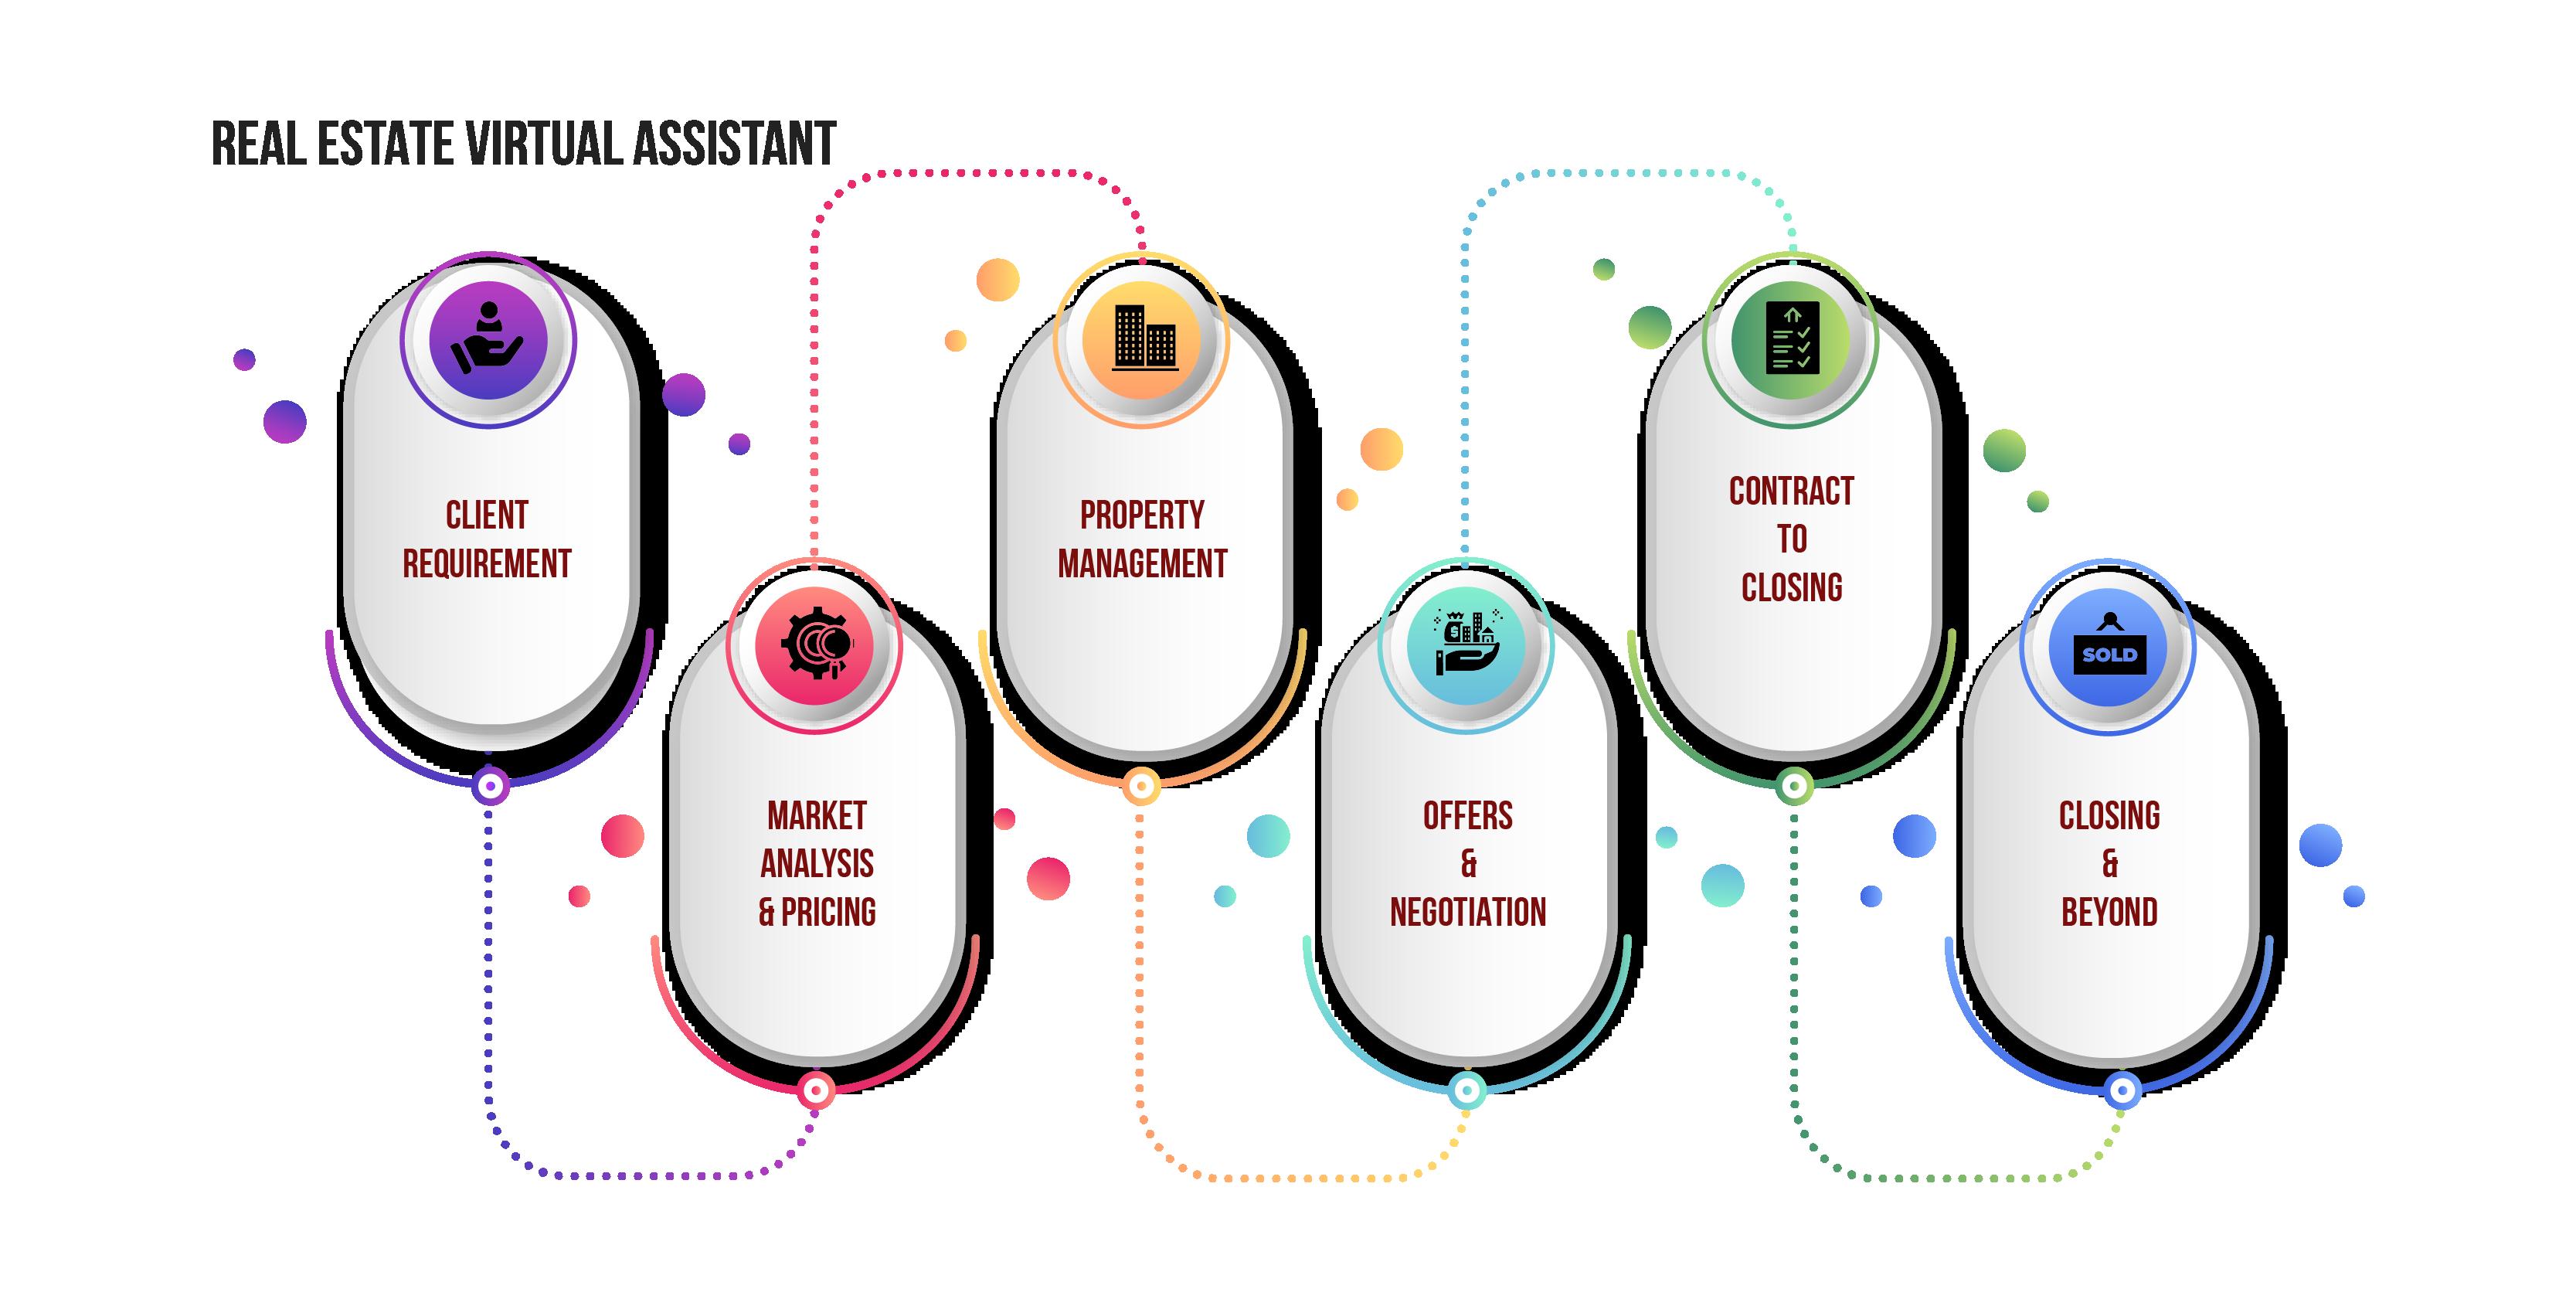 Real Estate Virtual Assistant Service Process